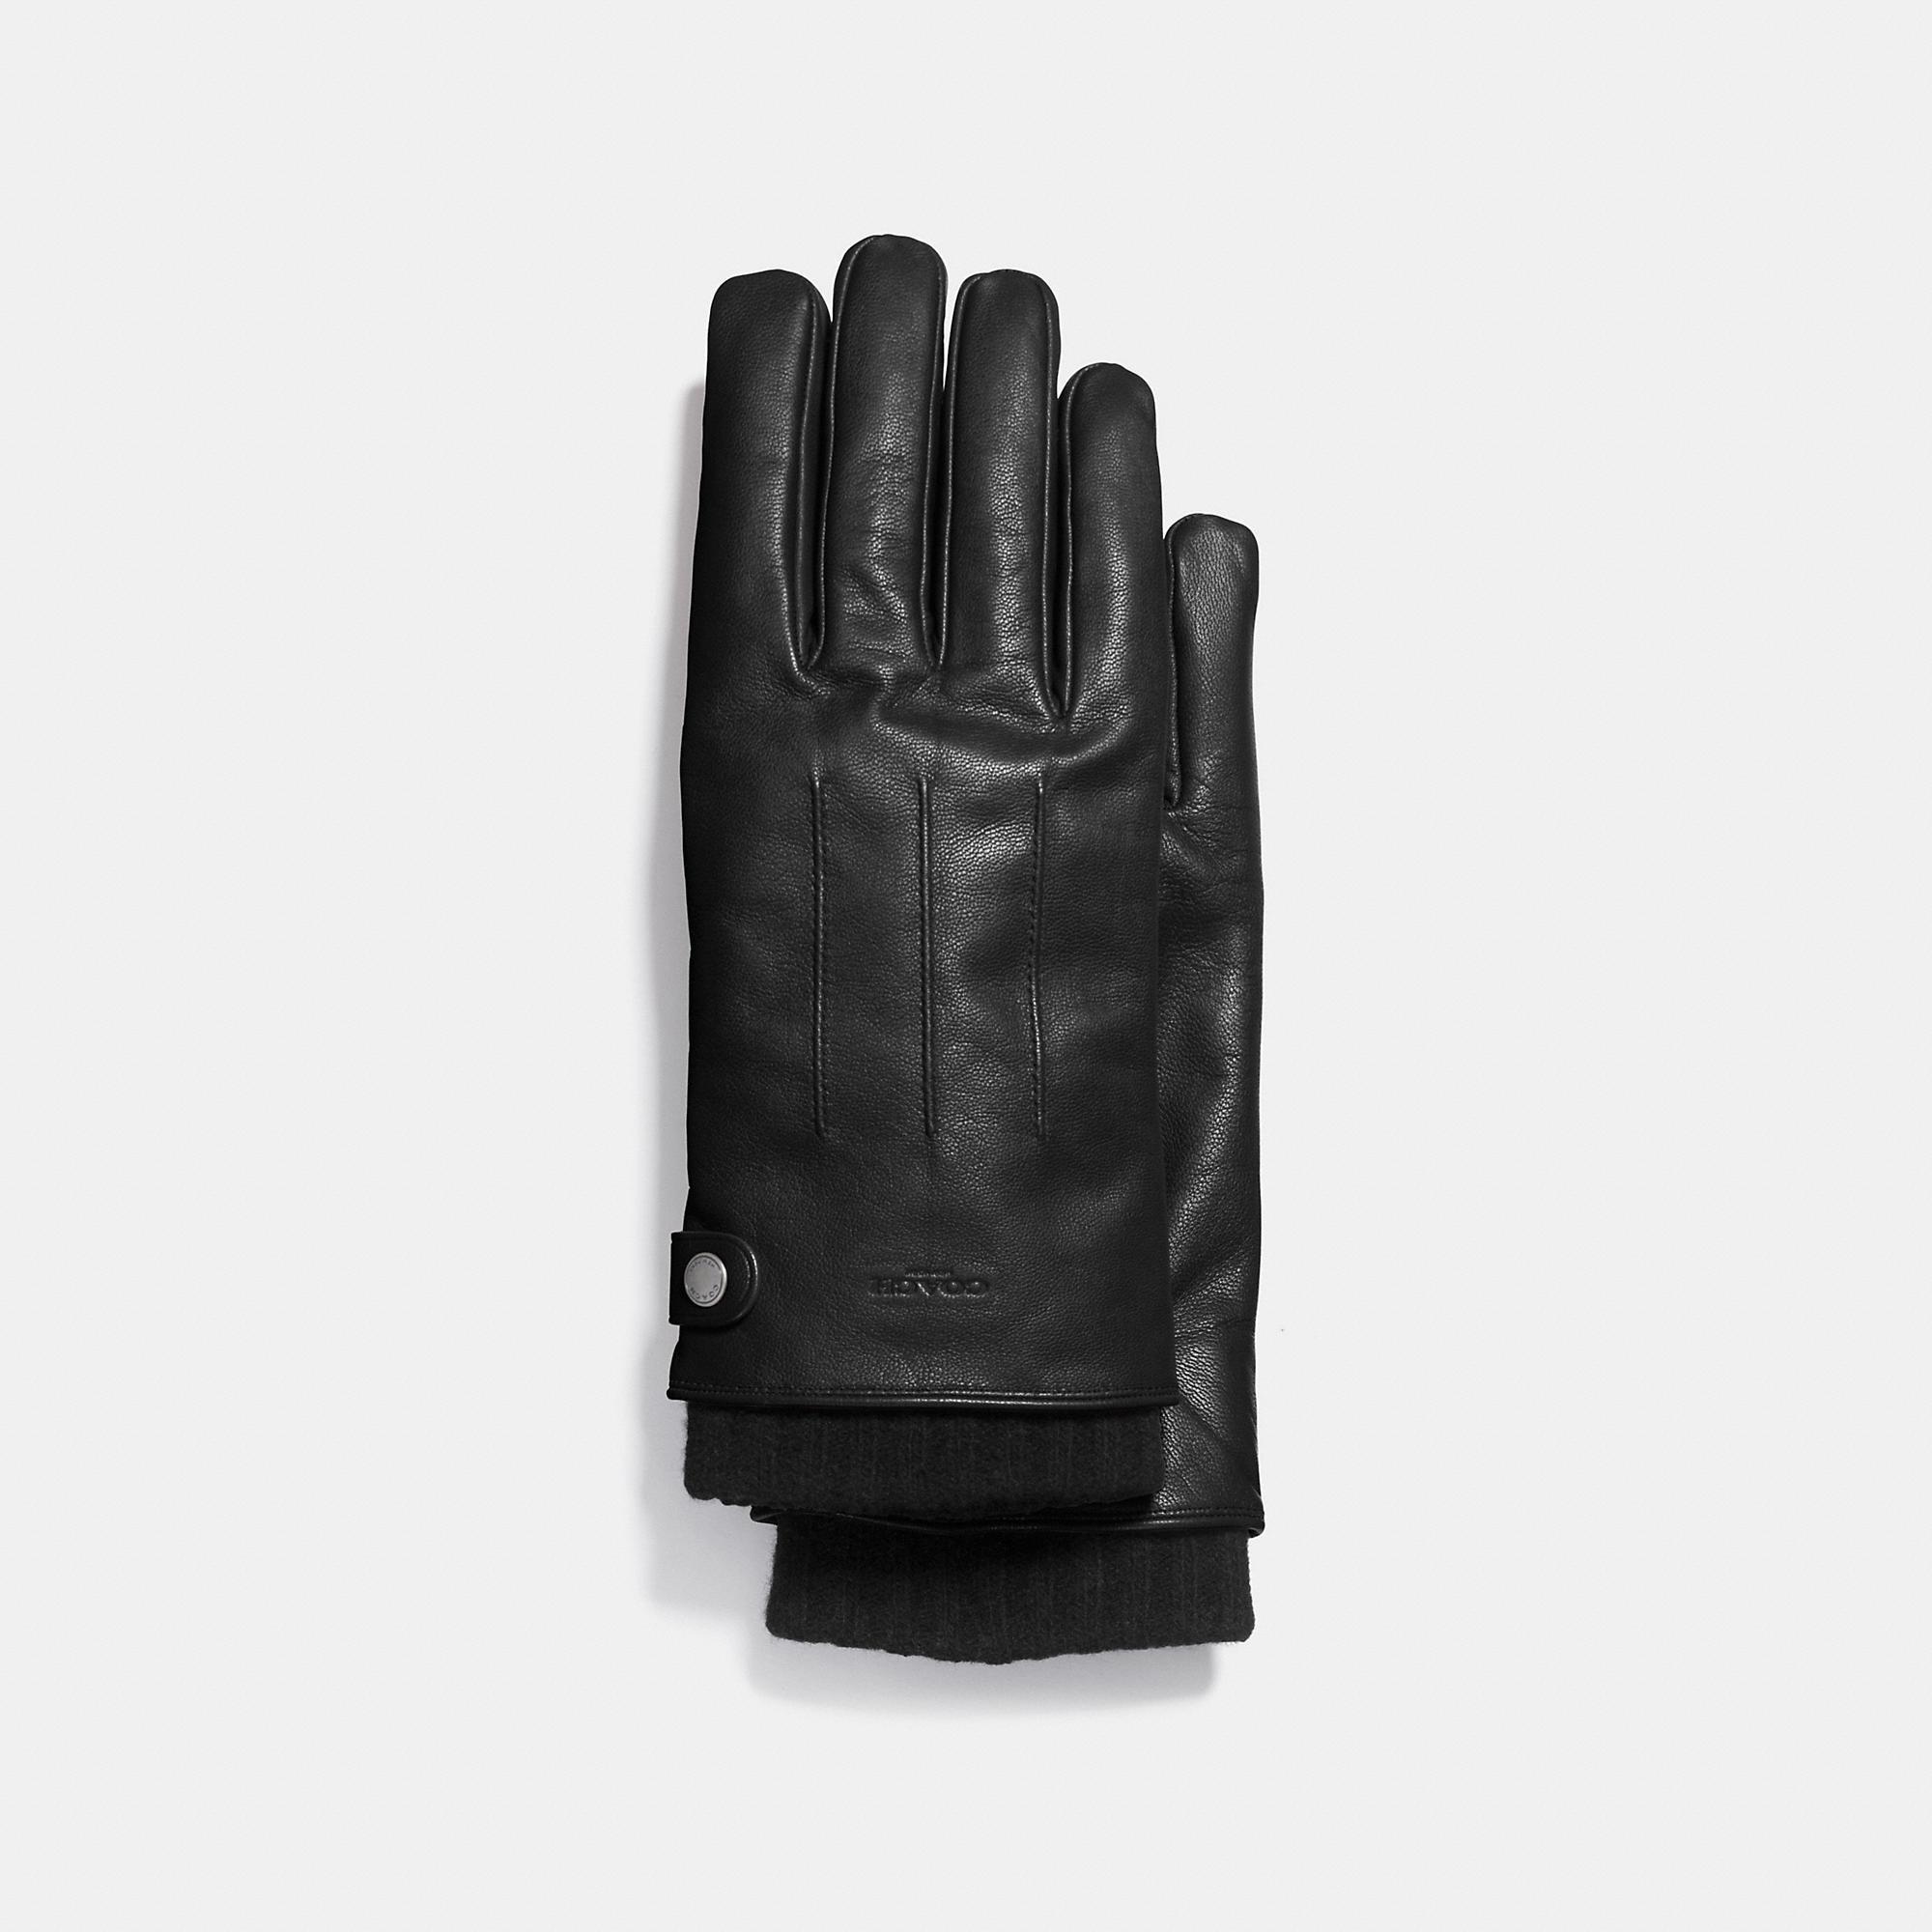 Coach 3-in-1 Glove In Leather